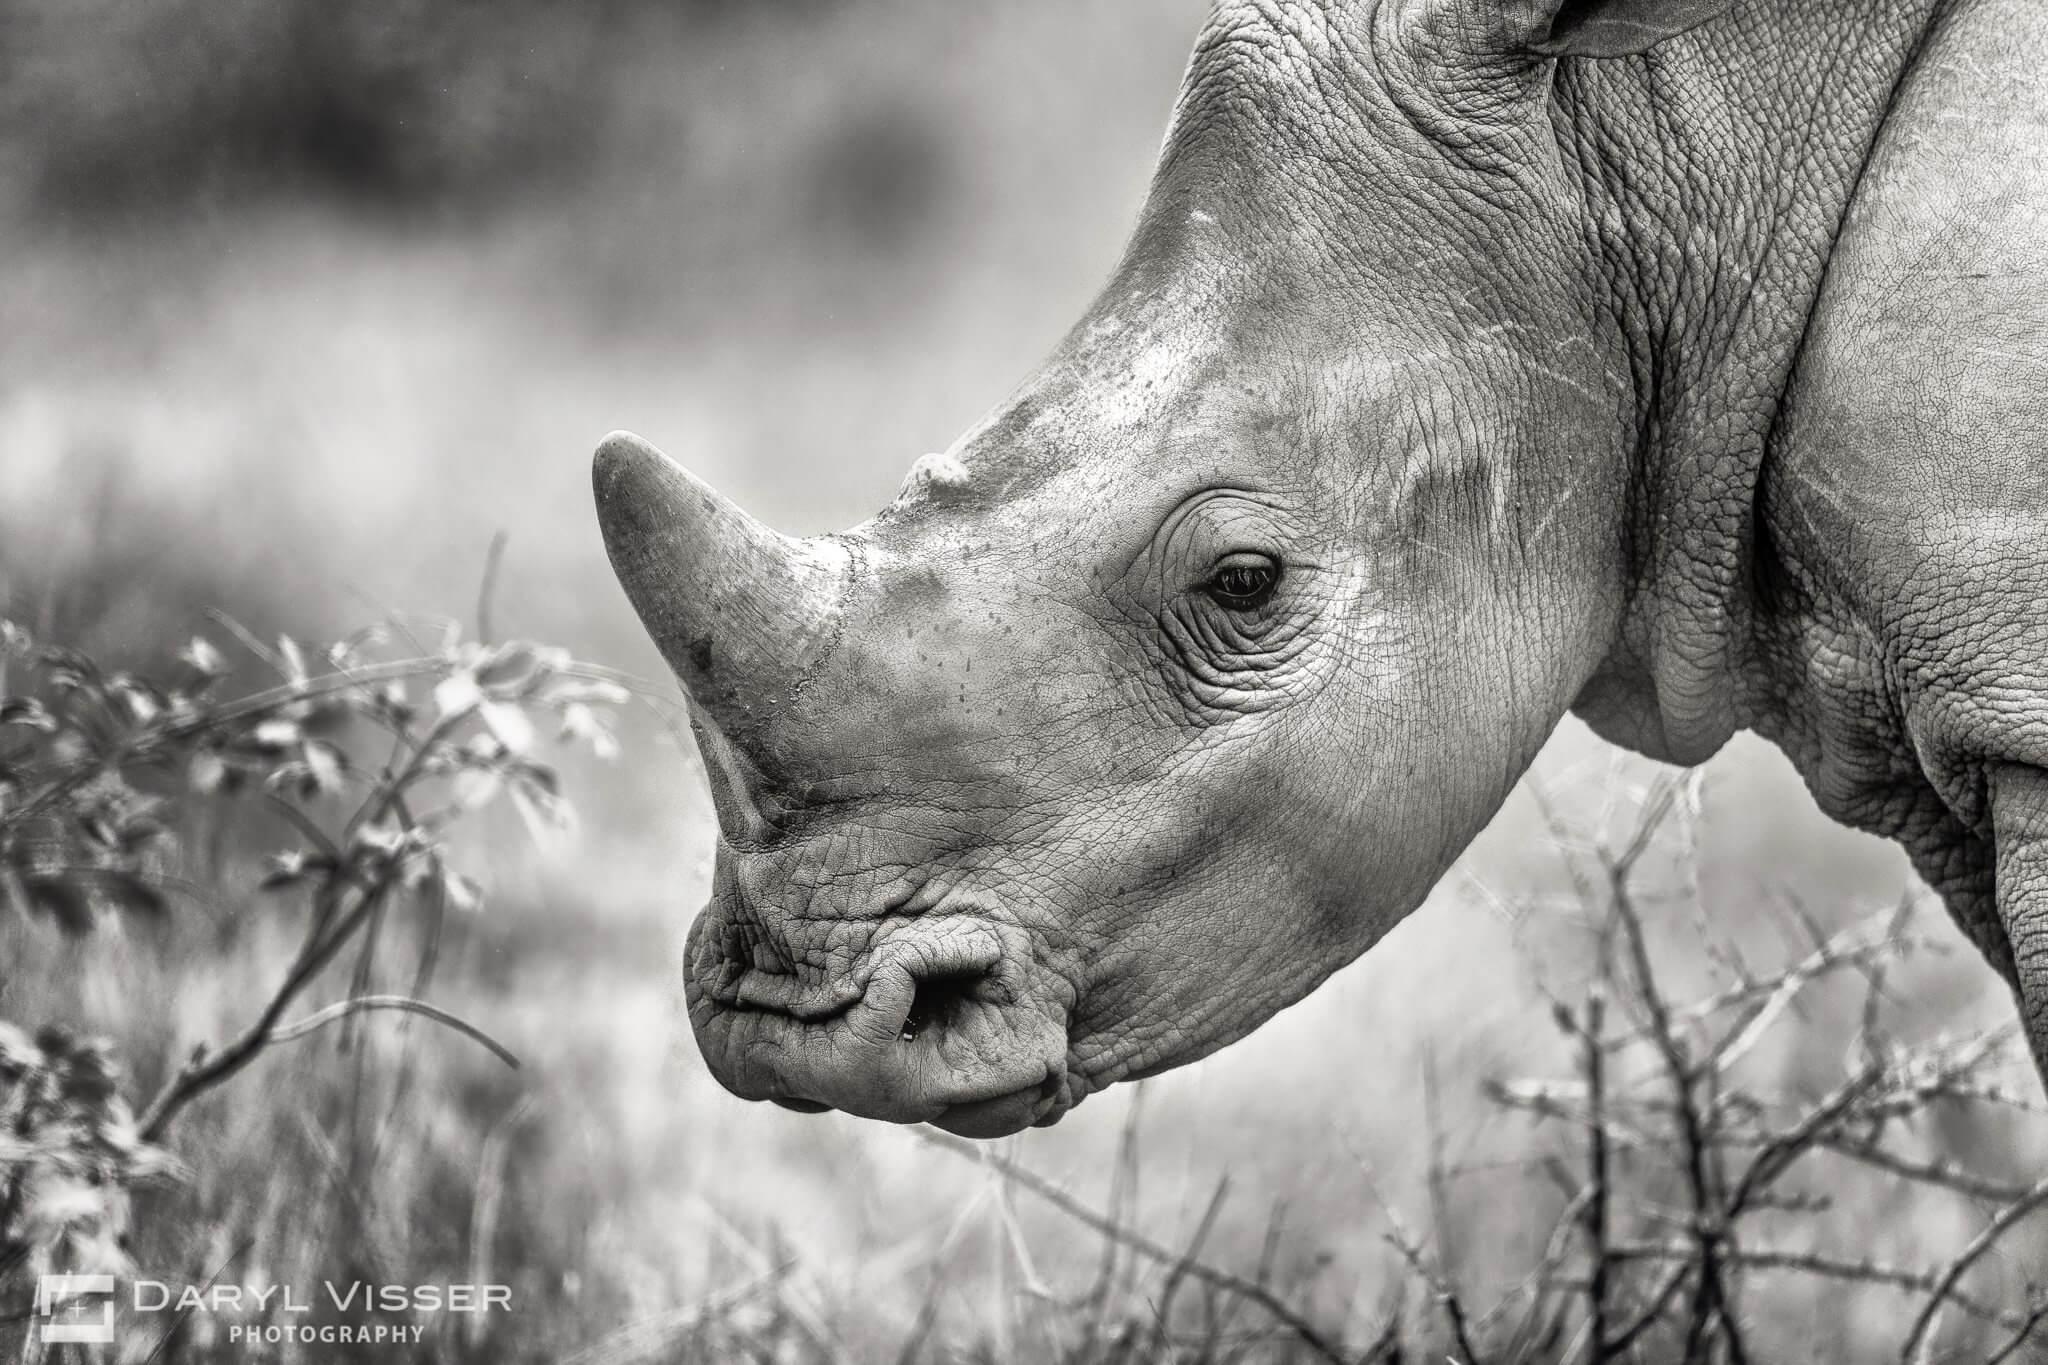 isimangaliso rhino